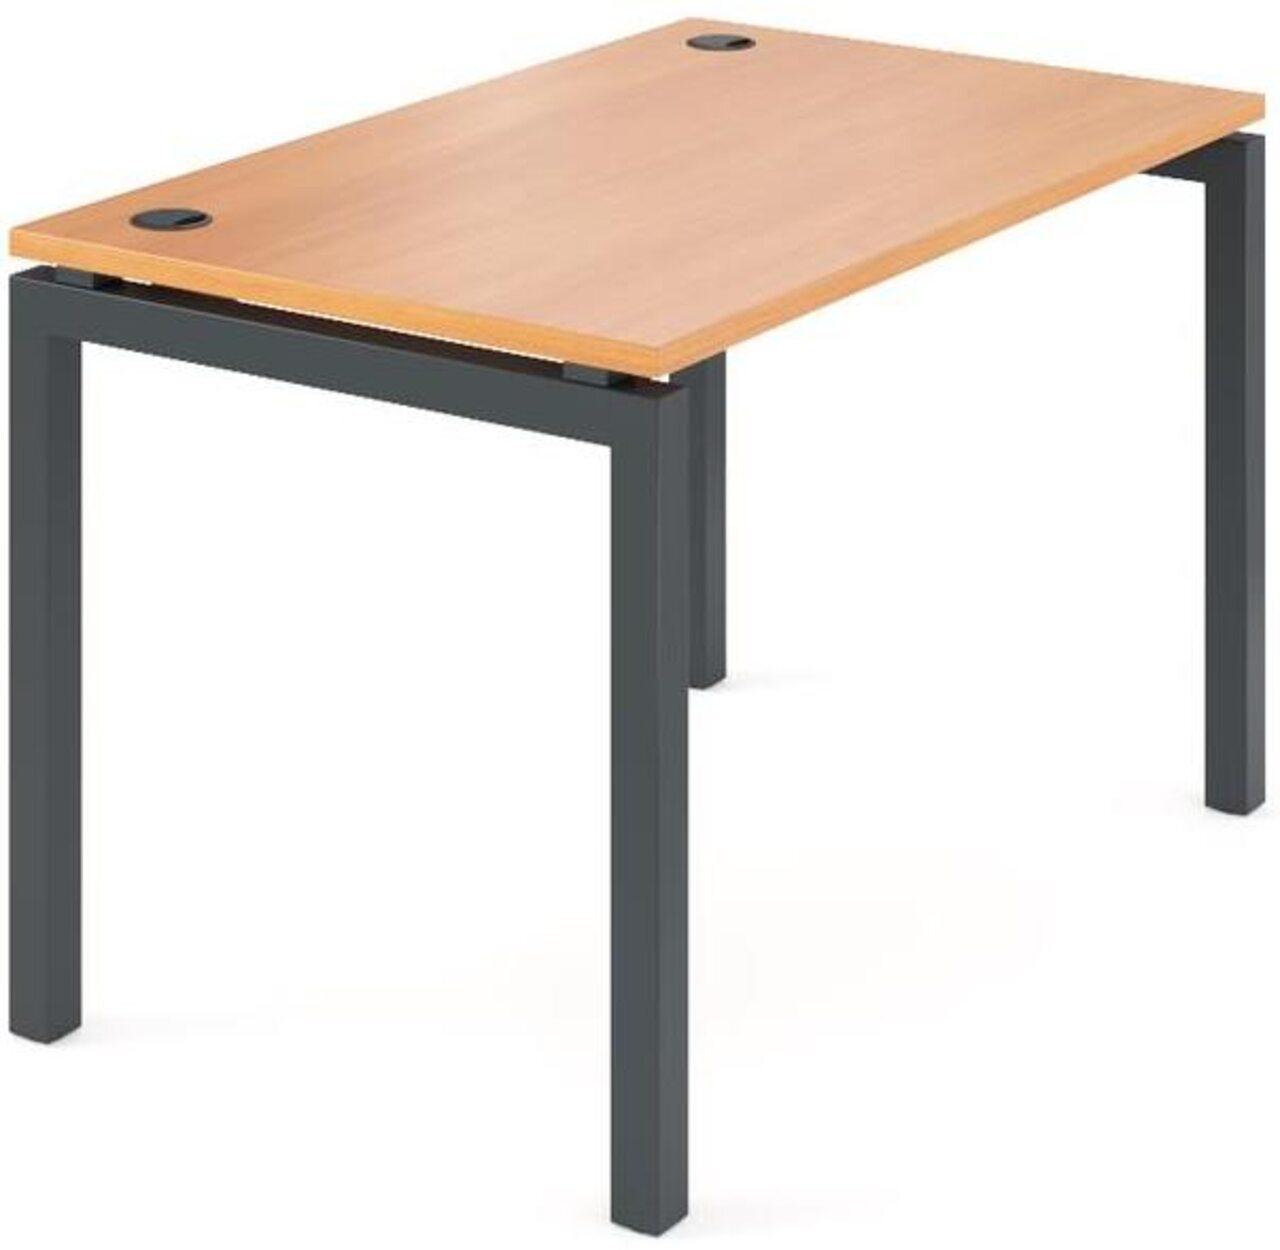 Стол на металлокаркасе  Арго 120x73x76 - фото 2